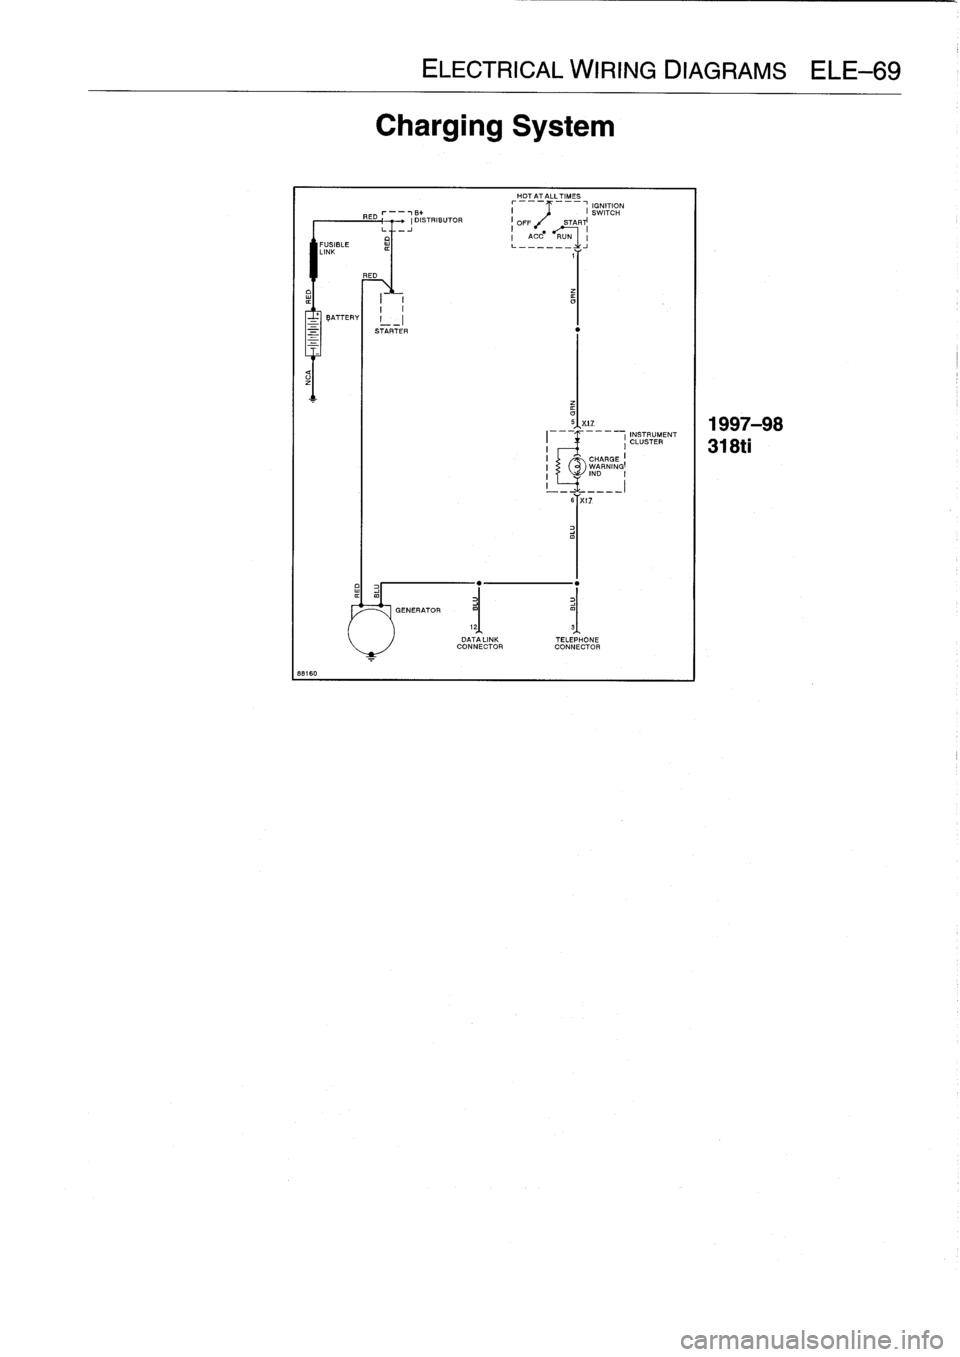 E36 Cluster Wiring Diagram